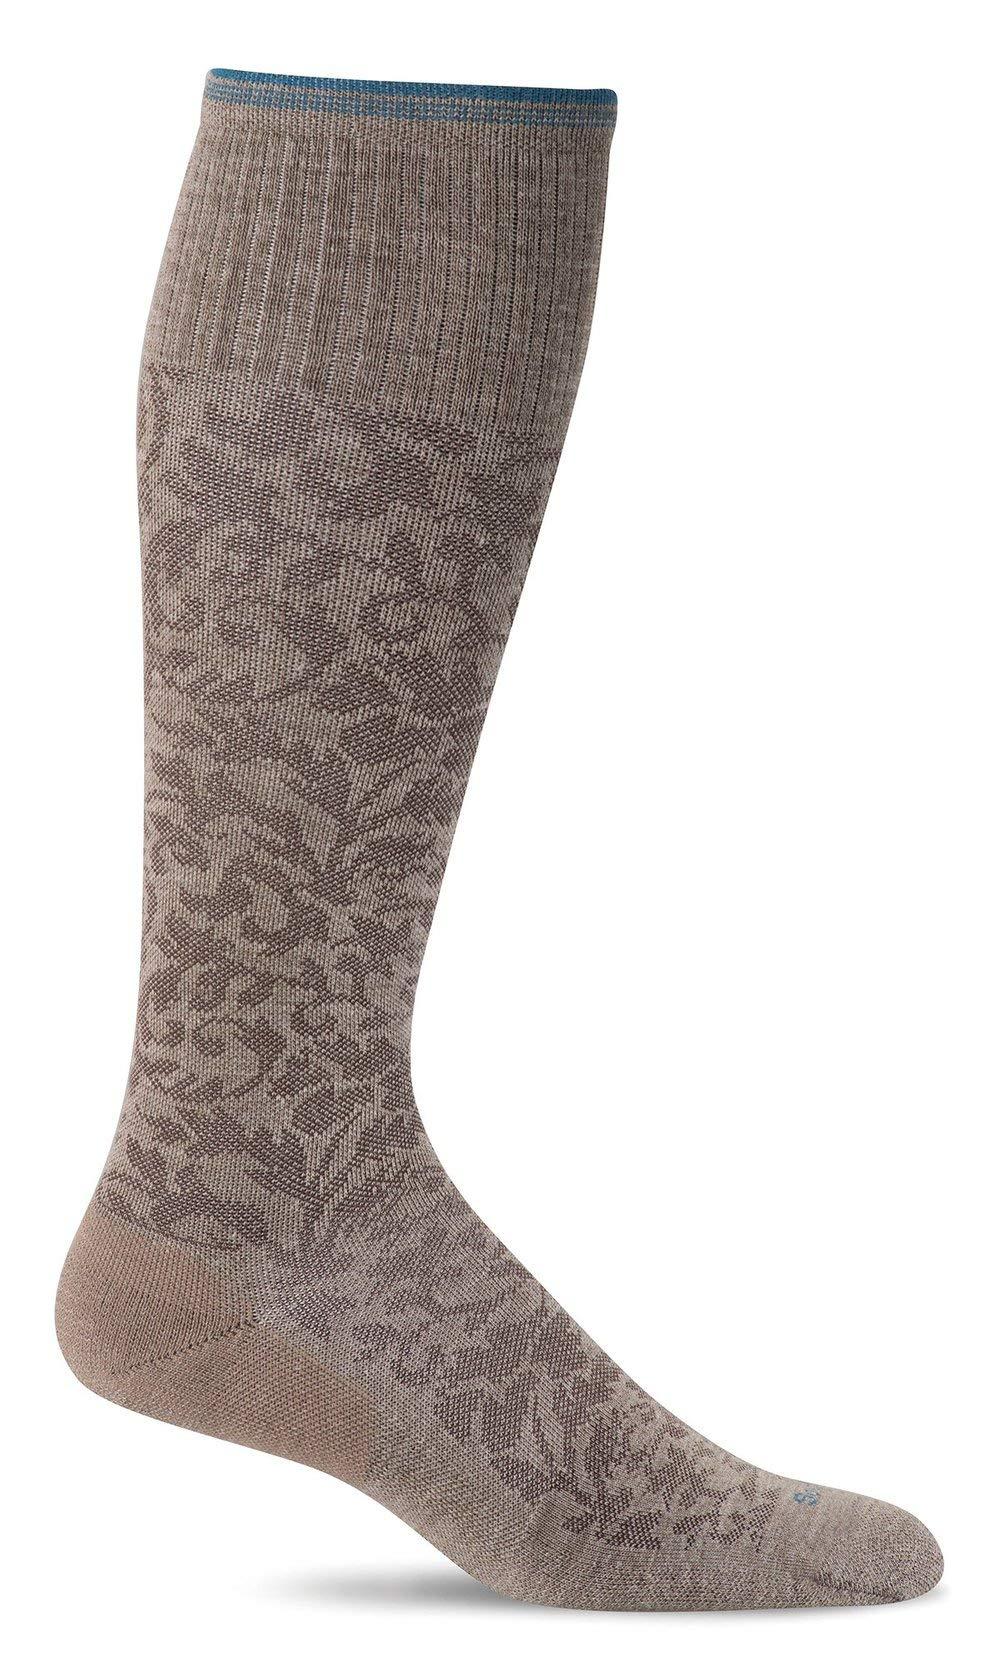 Sockwell Women's Damask Moderate Graduated Compression Socks, Khaki, Small/Medium